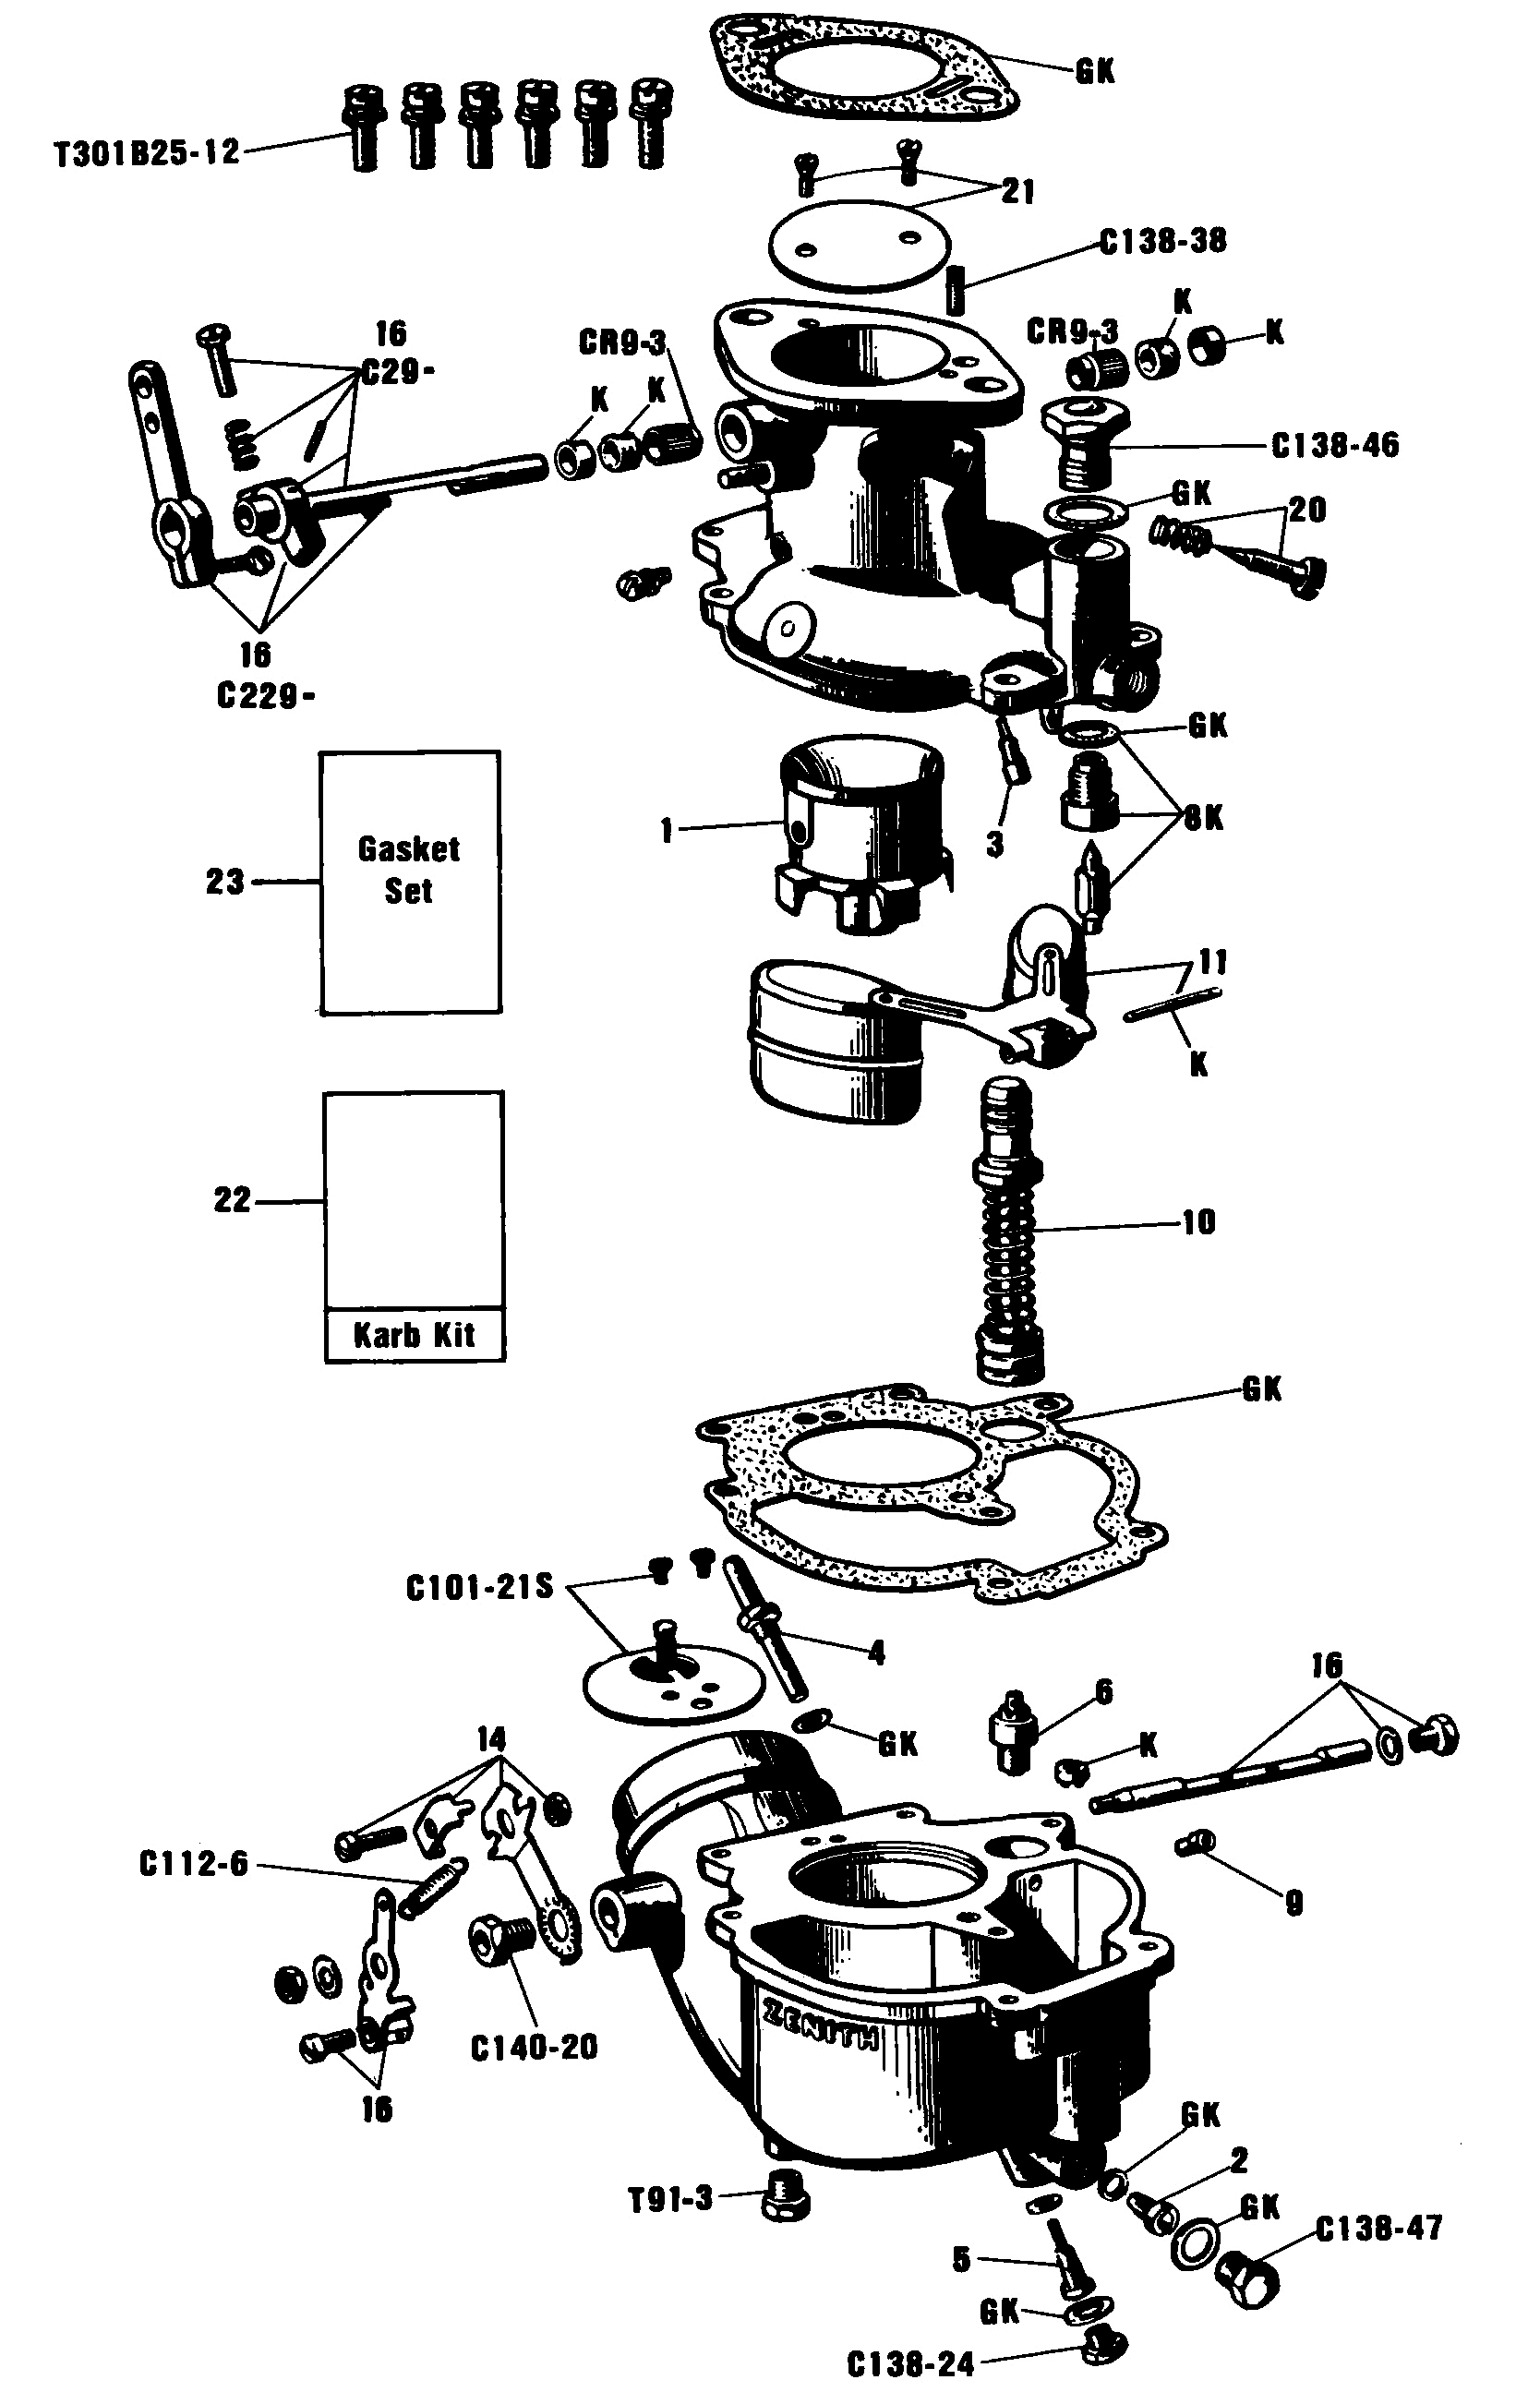 Zenith Carburetor Parts Diagram